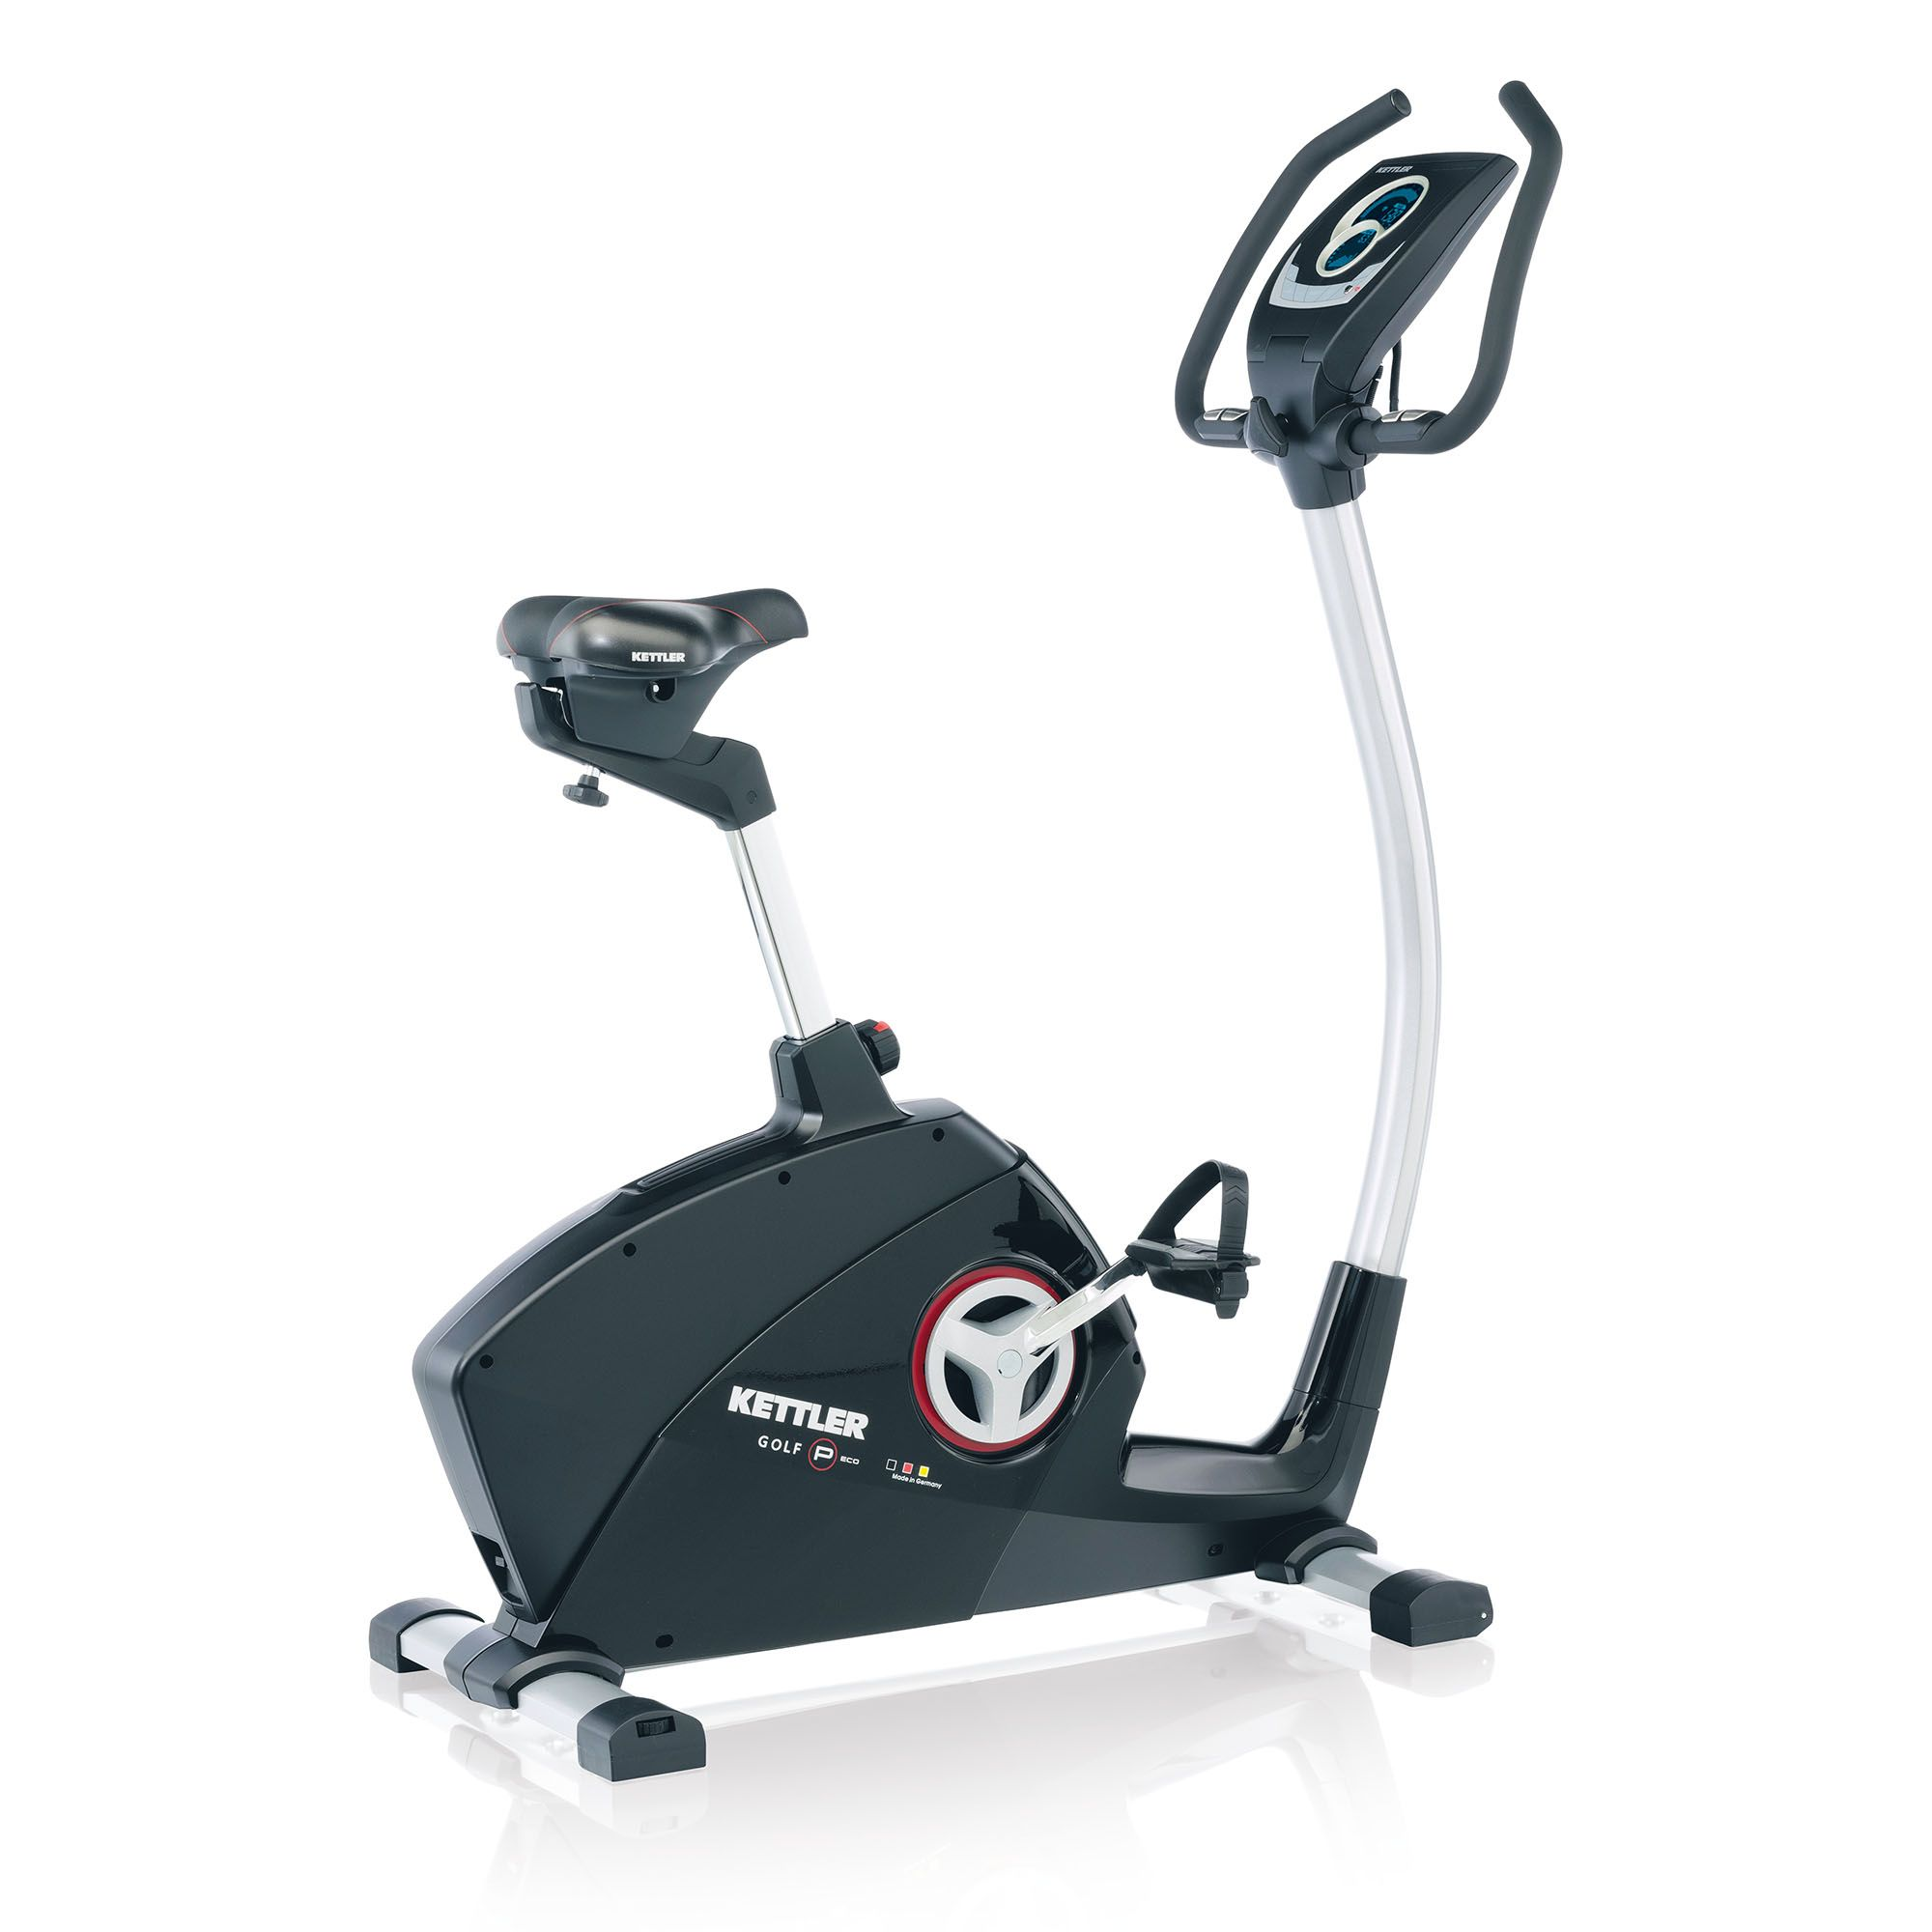 Kettler Golf P Eco Upright Exercise Bike Sweatband Com